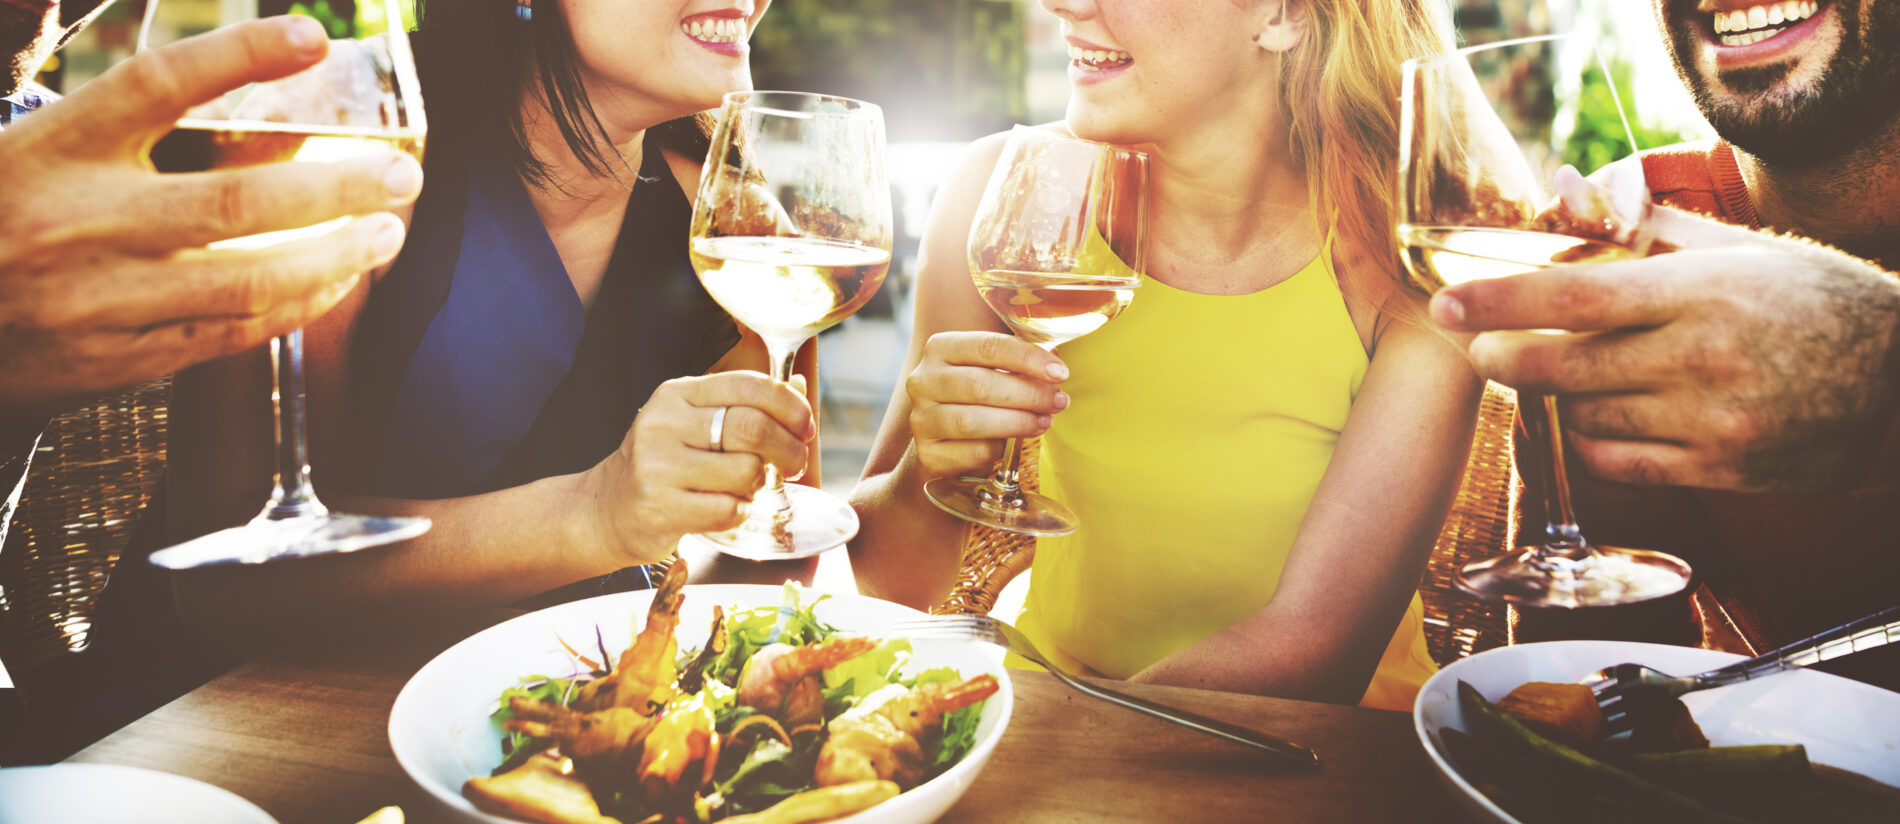 Friends outdoor dining in Marbella, Spain